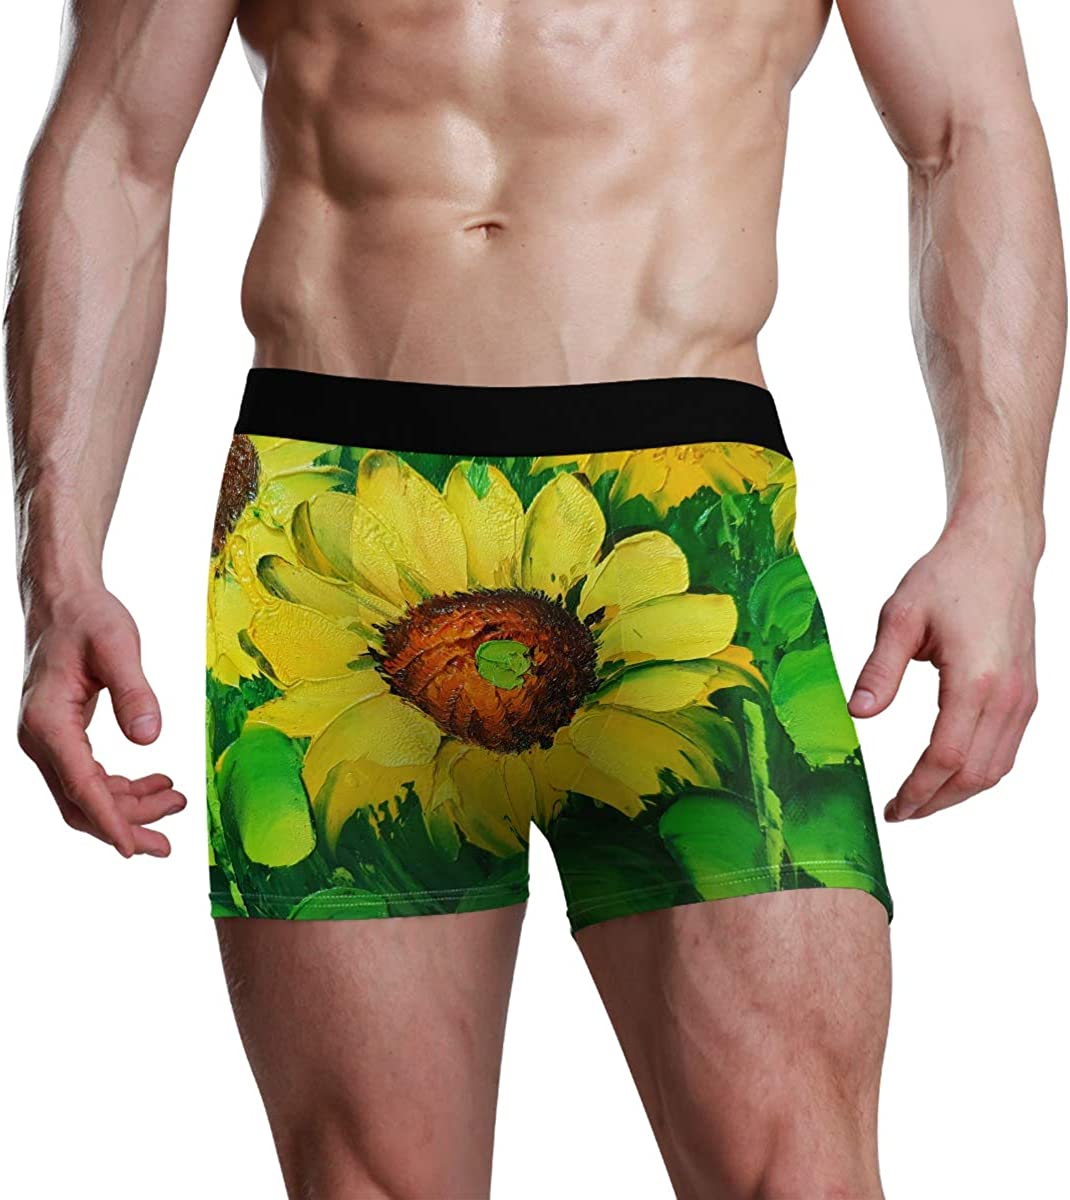 HangWang Men's Boxer Briefs Colorful Sunflowers Oil Painting Green Yellw Bikini Underwear Stretch Trunks Boys Underpants